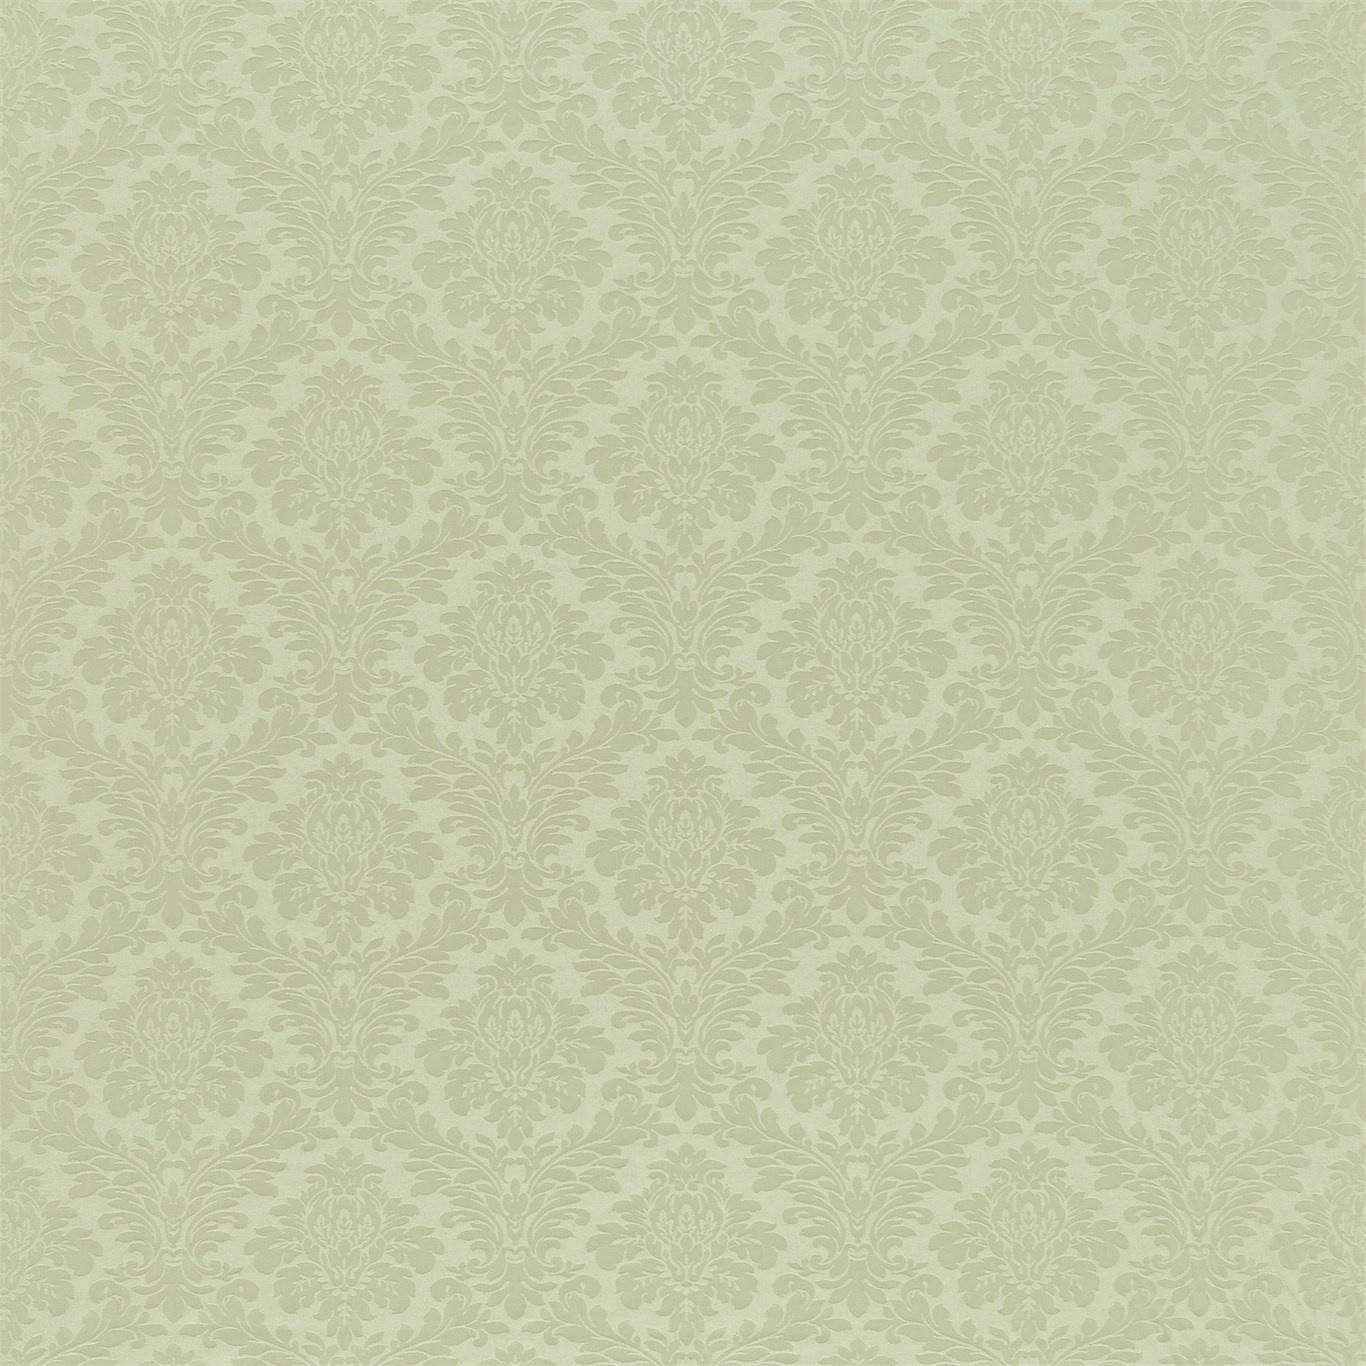 Image of Sanderson Lymington Damask Eggshell Fabric 232599